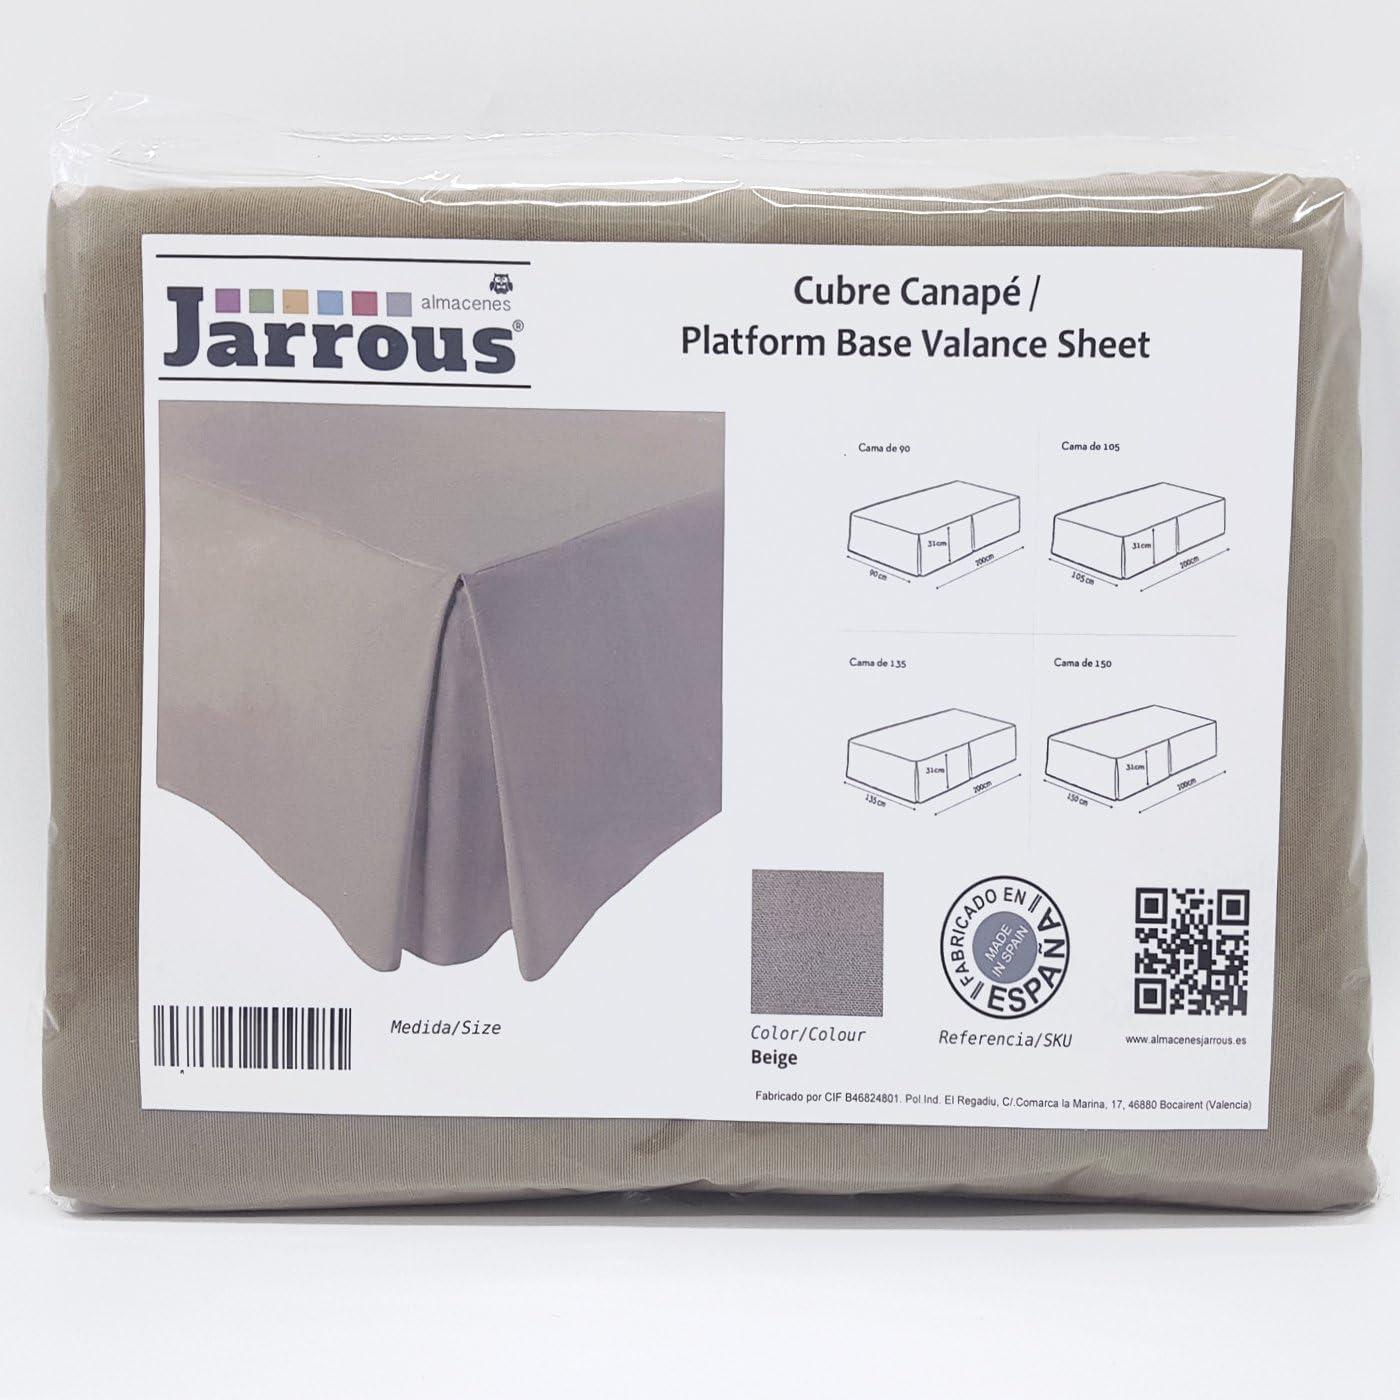 Jarrous Cubre Canapé Modelo Pierre, Color Beige, Medida para Cama de 90